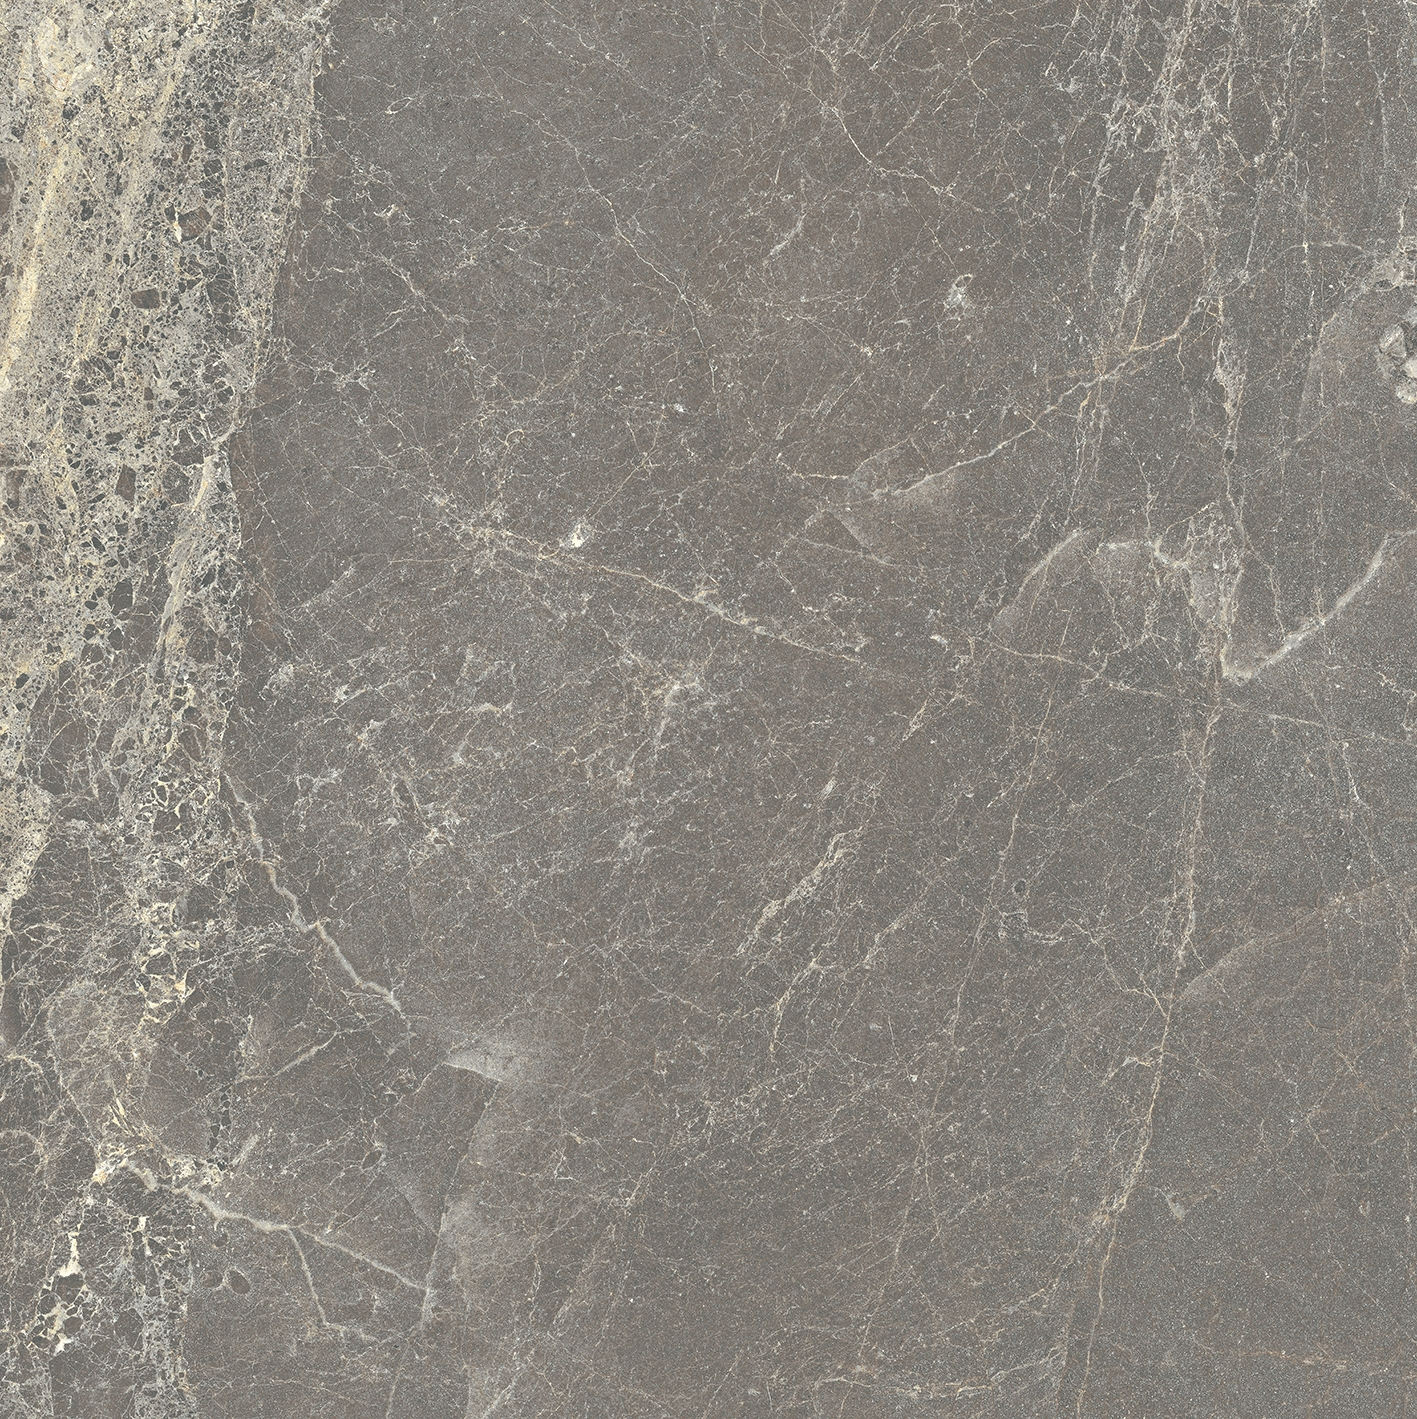 Exalt of Cerim Gray Lace Glossy 10mm 60 x 60